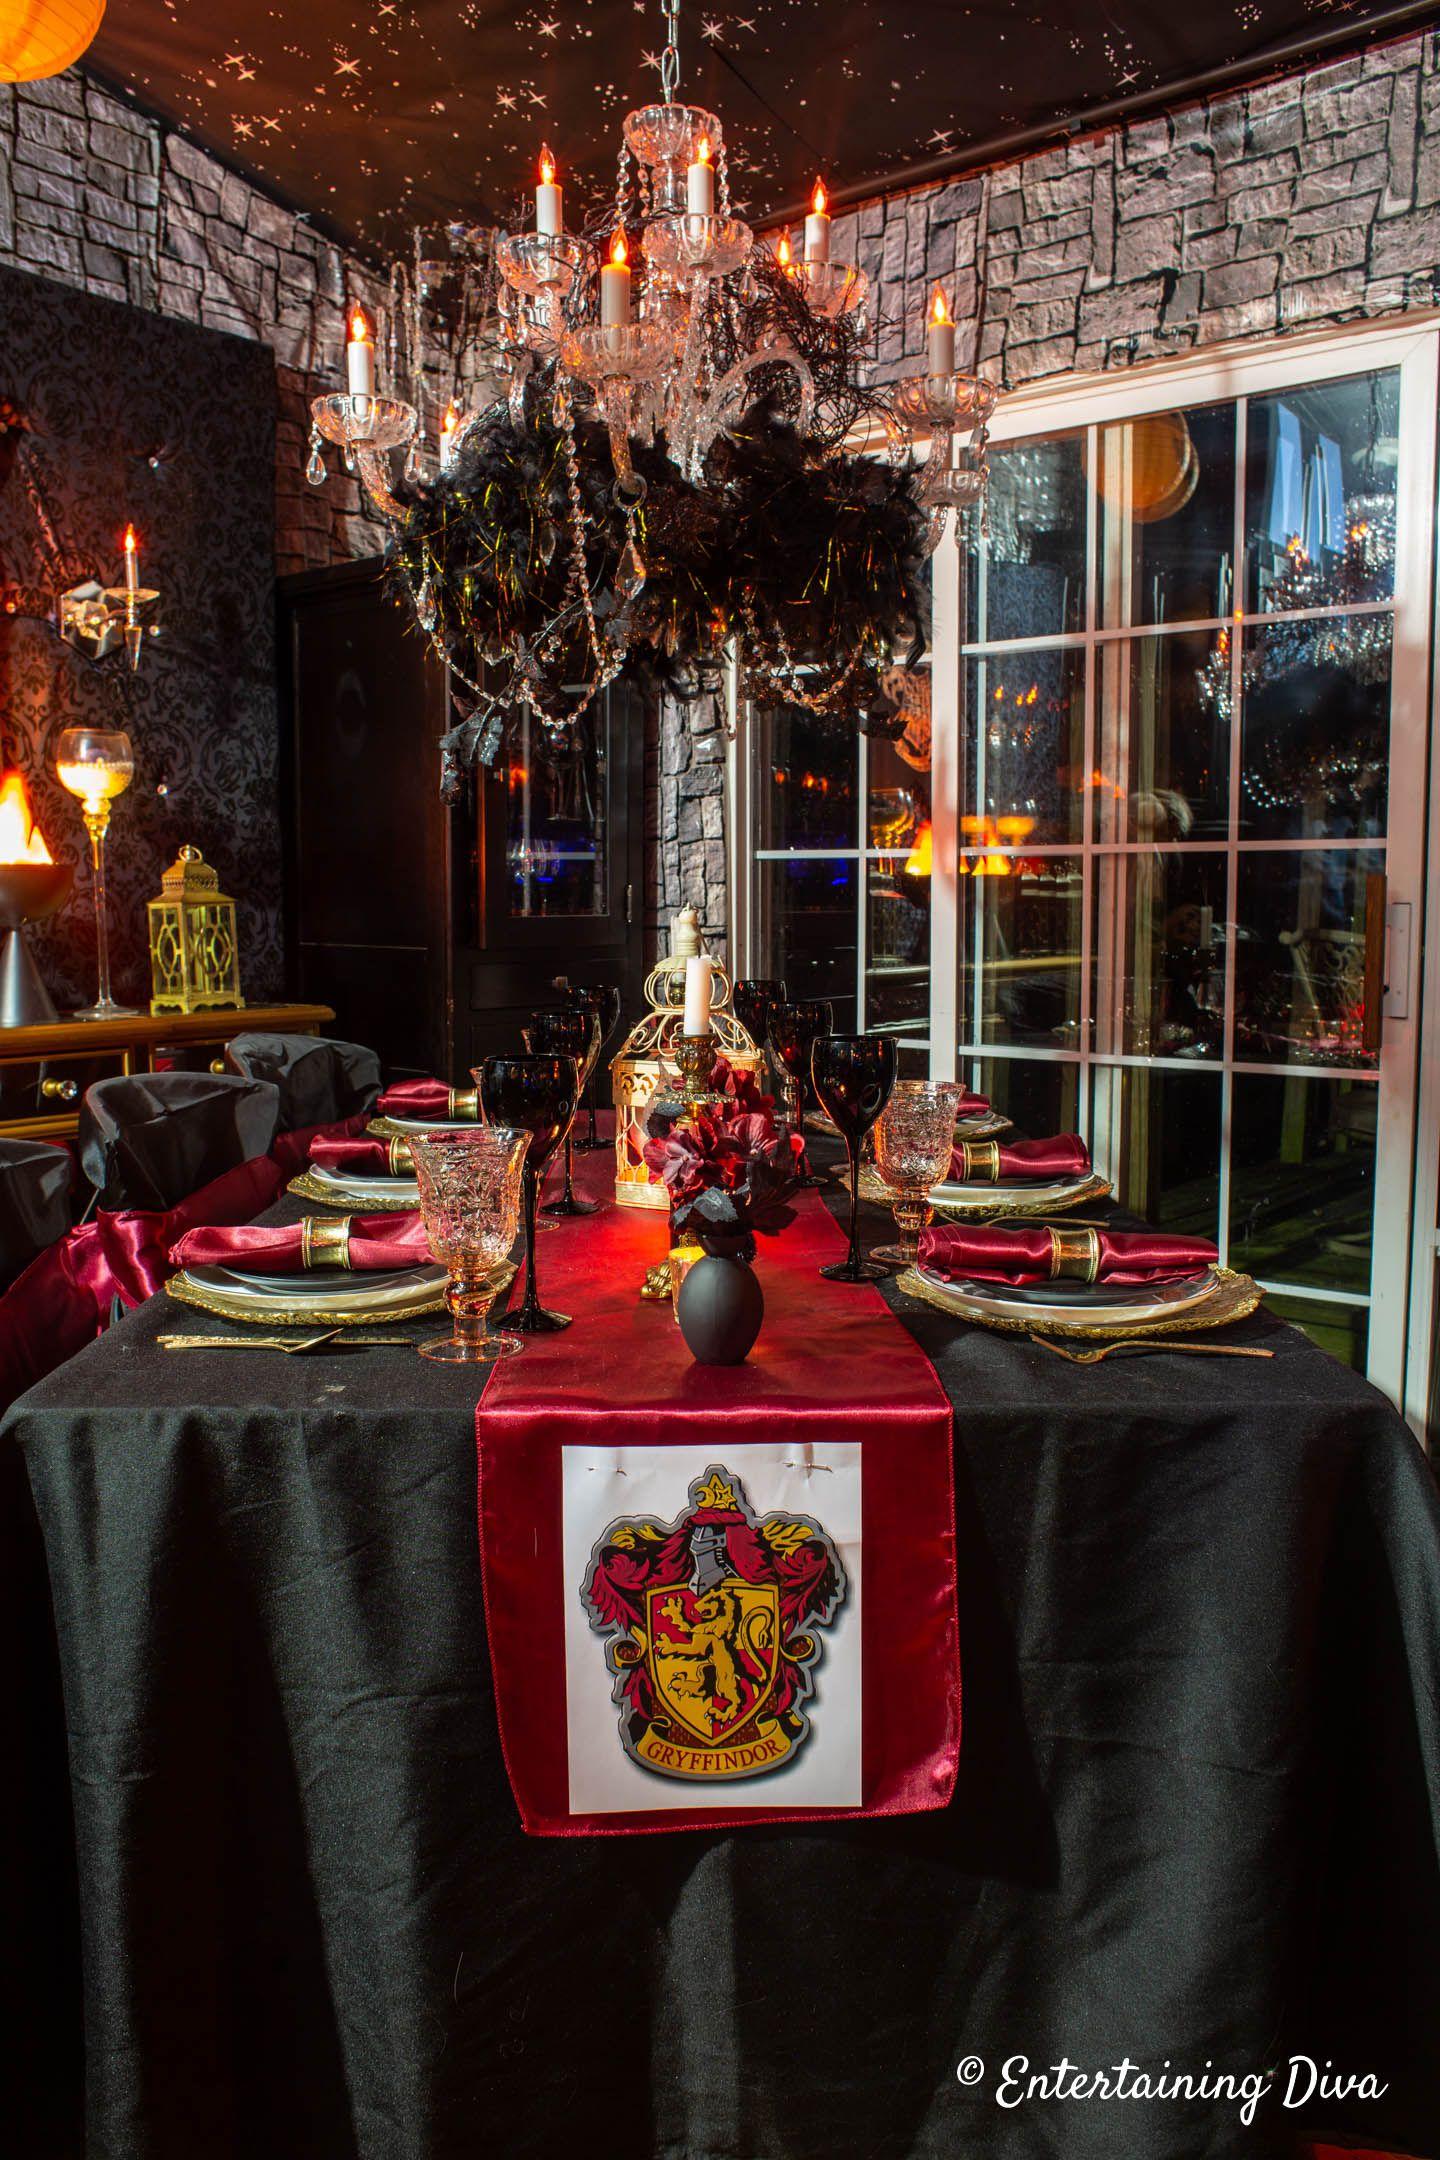 Harry Potter Table Decor Ideas Entertaining Diva From House To Home Harry Potter Table Table Decorations Harry Potter Christmas Decorations